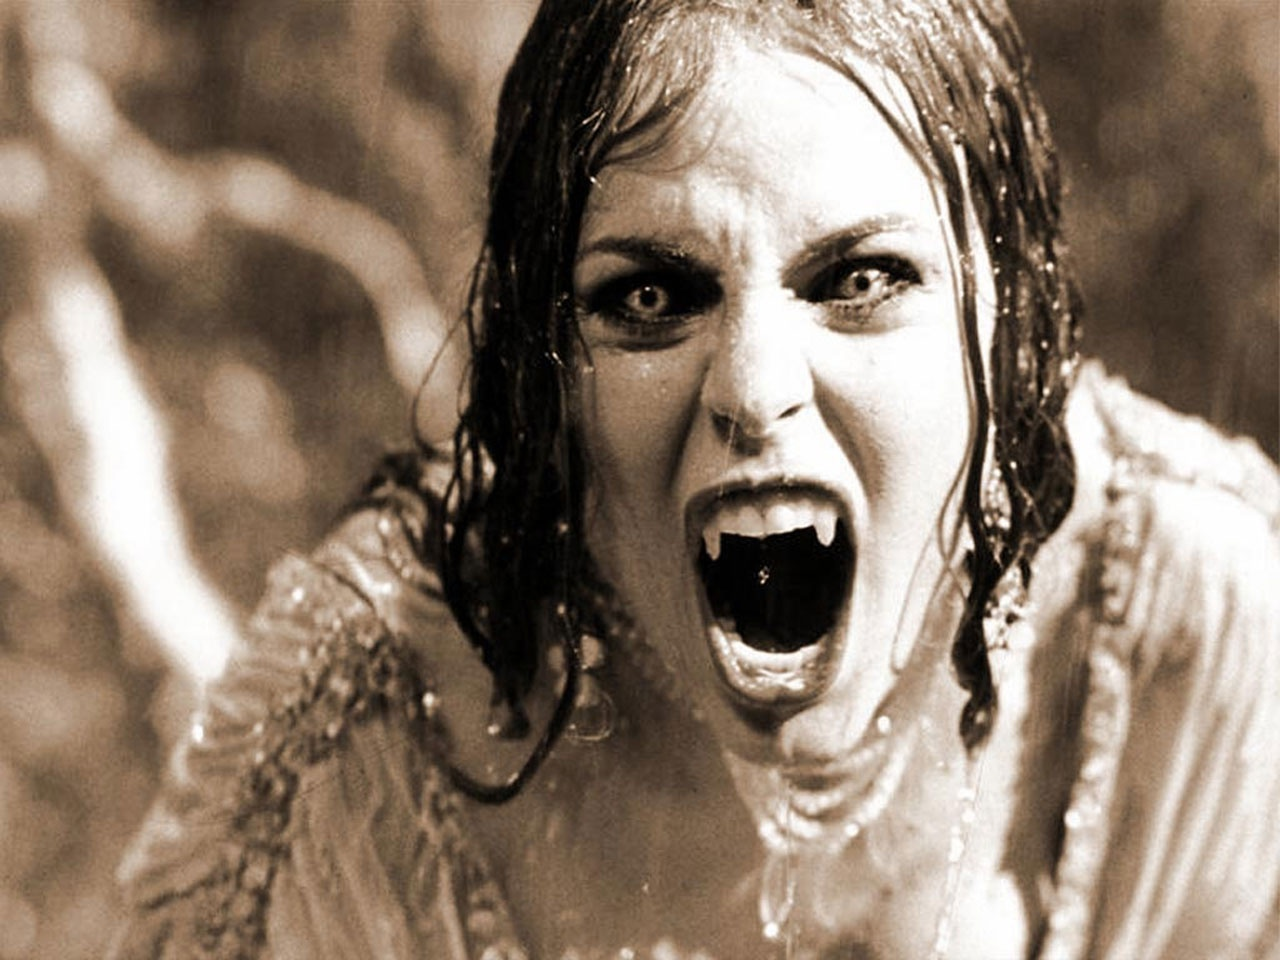 mujer chupa sangre enbrujada